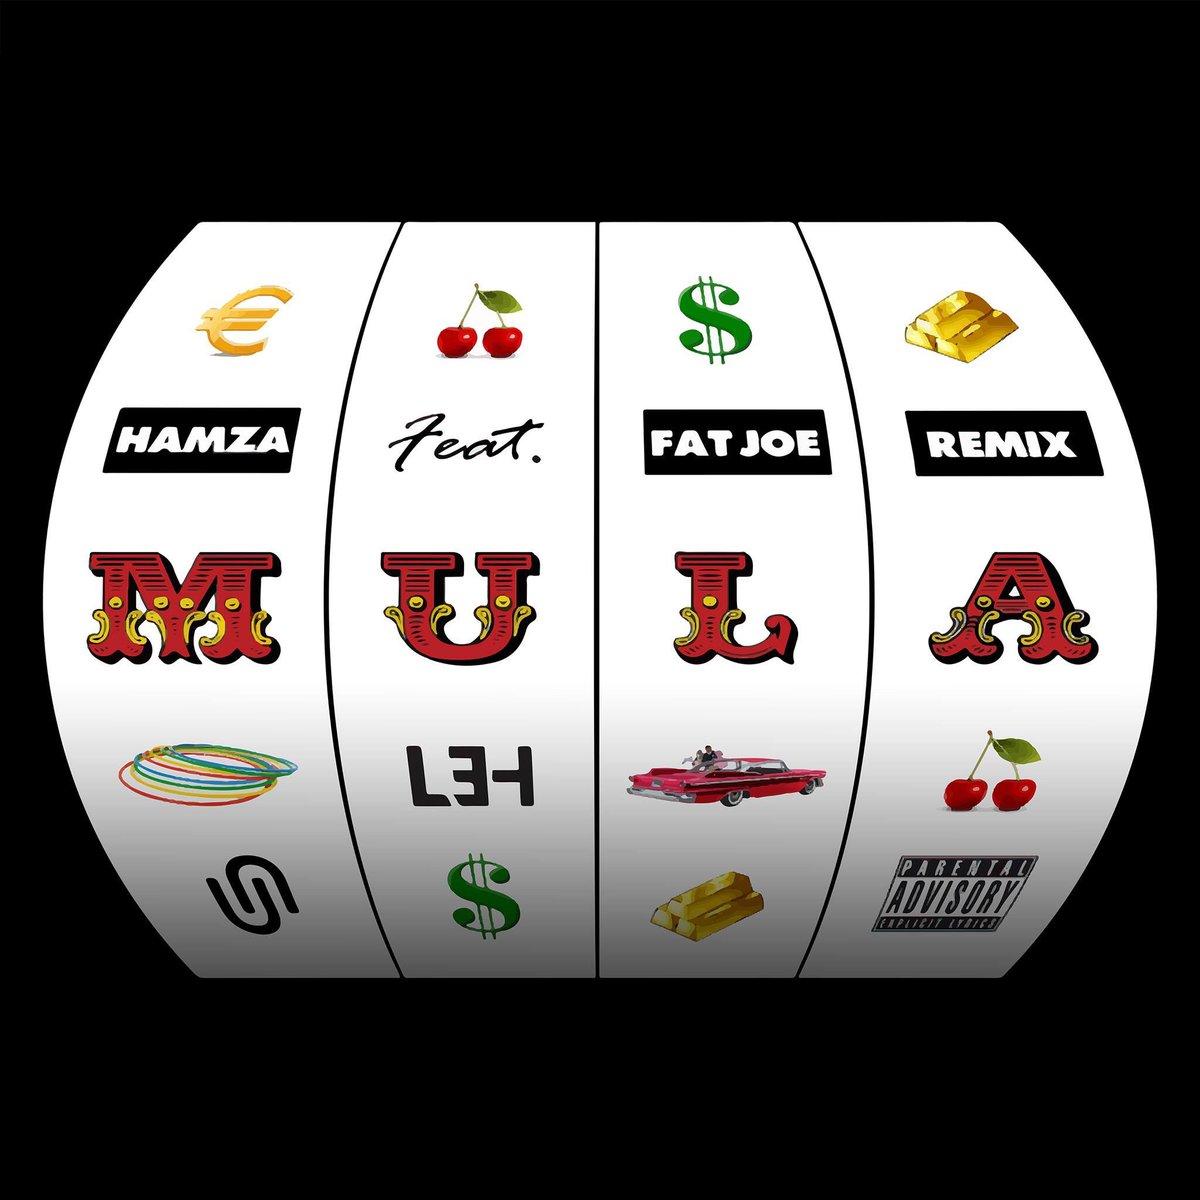 #Premiere du new Hamza ft Fat Joe ce soir sur NRJ ! #MulaRemix @HamzaThugMusic @fatjoe @NRJBelgique https://t.co/hf06aqlPcH